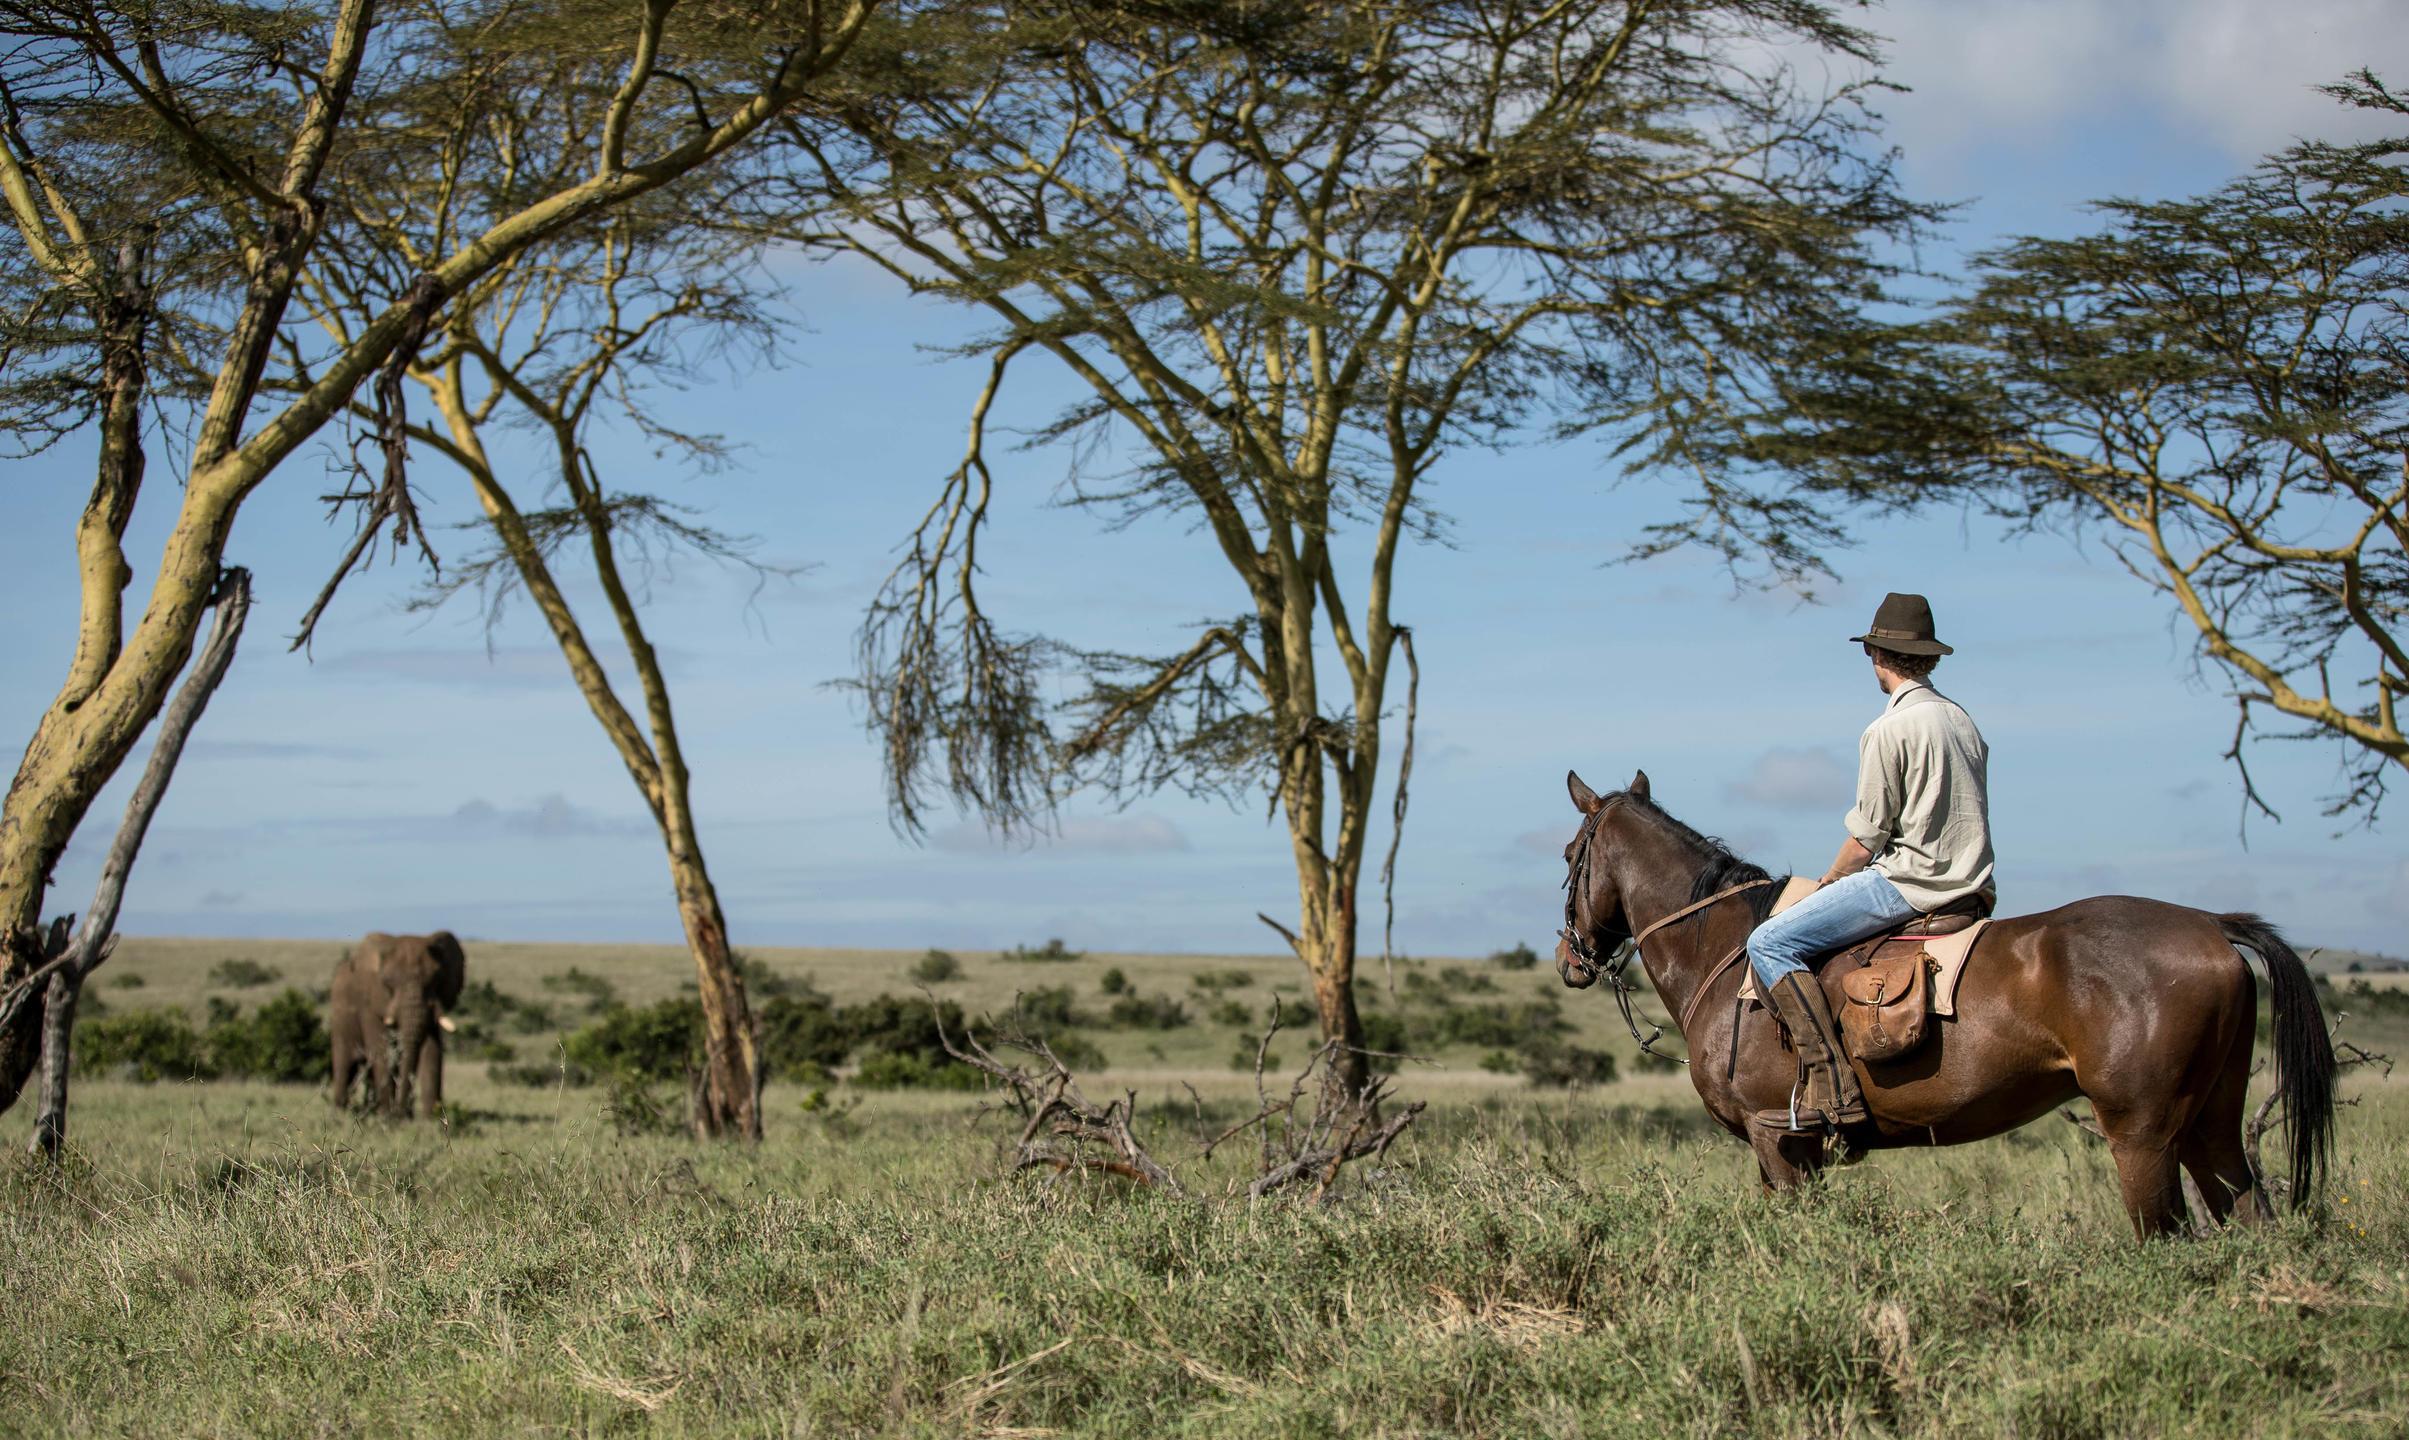 Day 04: Horseriding adventures in Borana